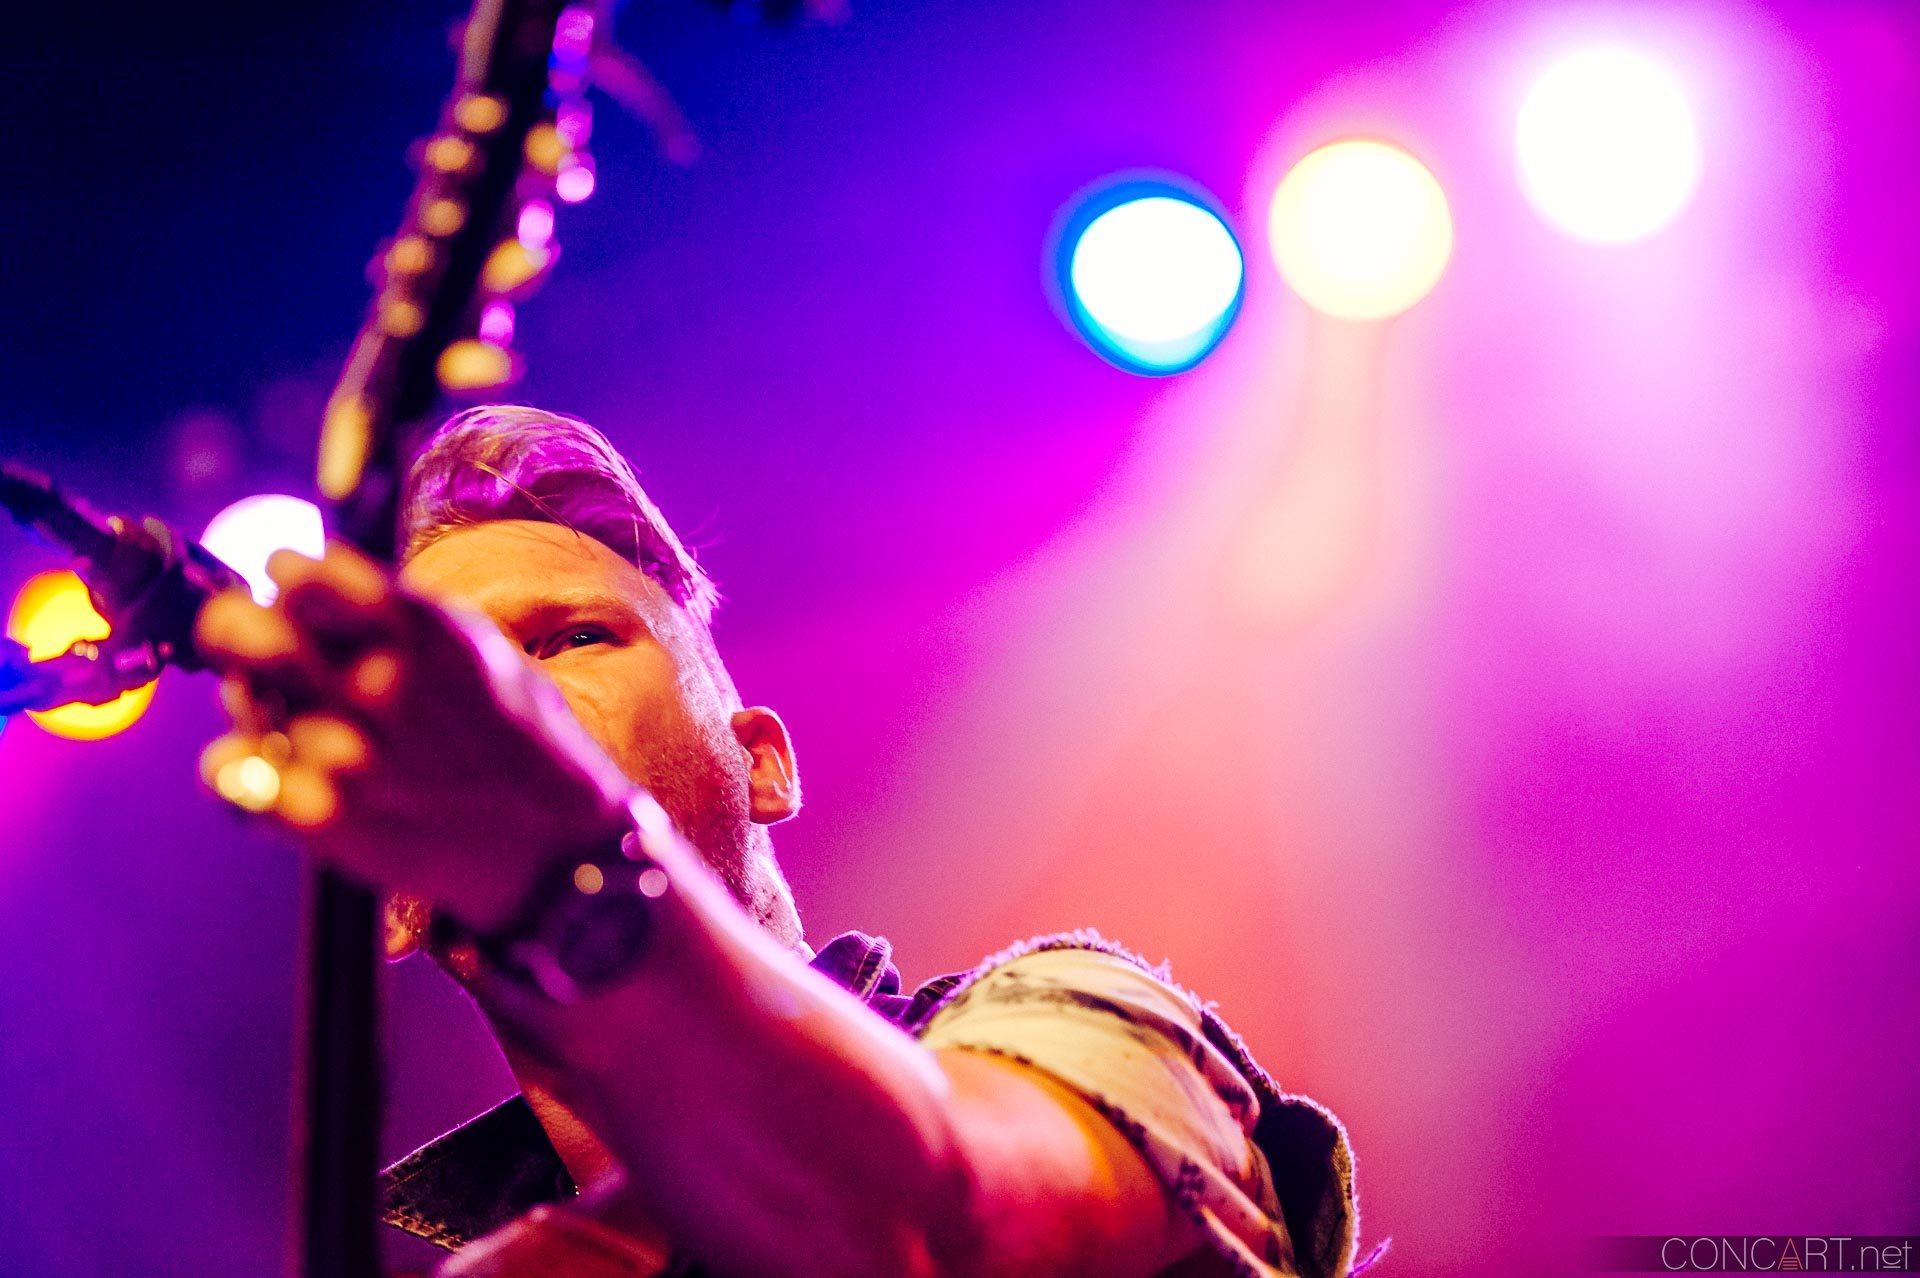 Neulore photo by Sean Molin 26